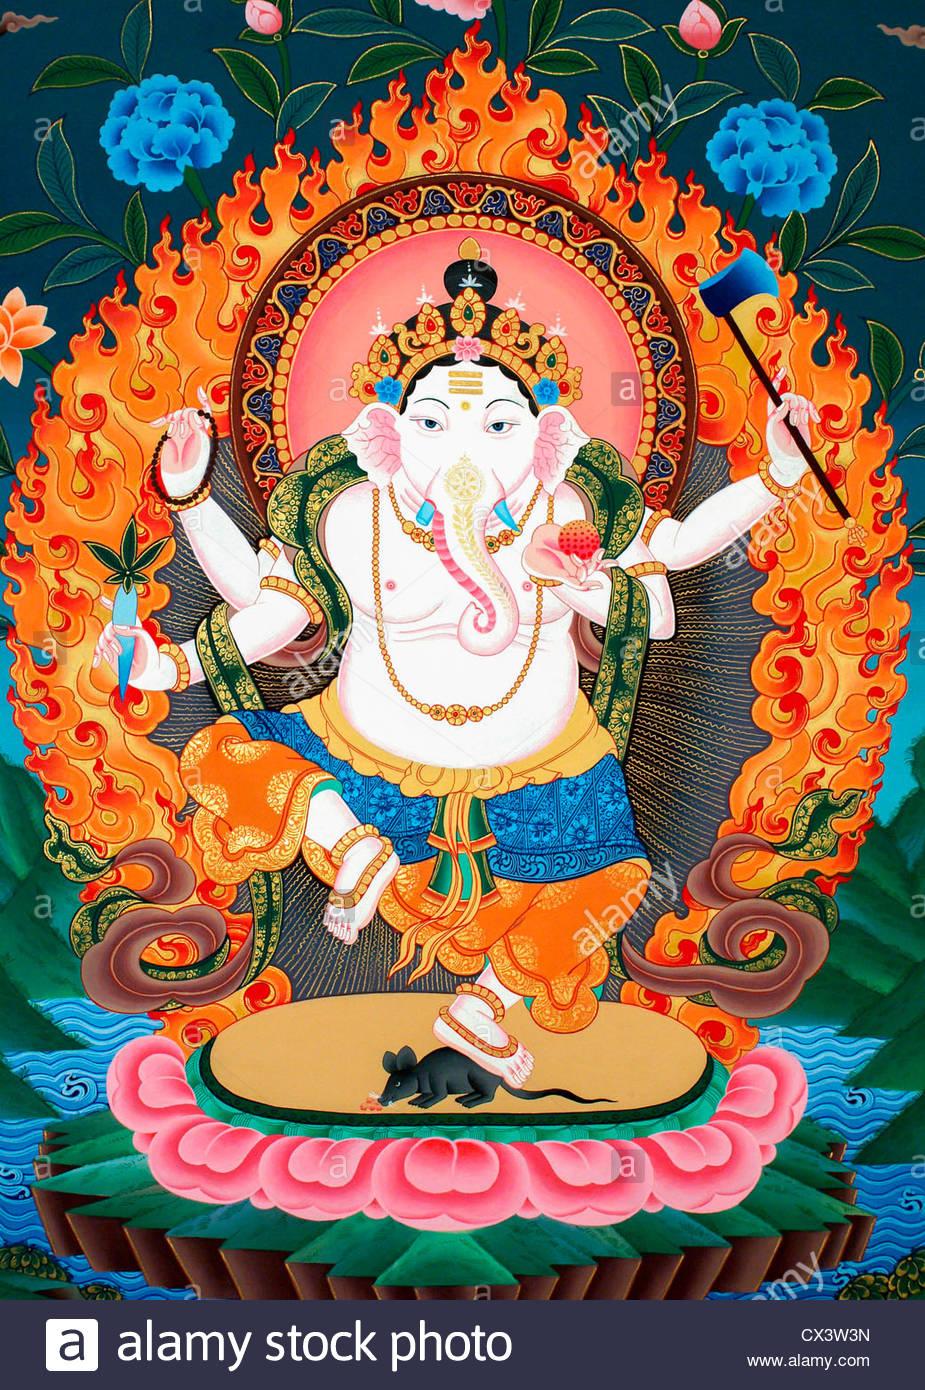 Nepali Painting Of Ganesh Or Ganesha The Hindu God Who Is